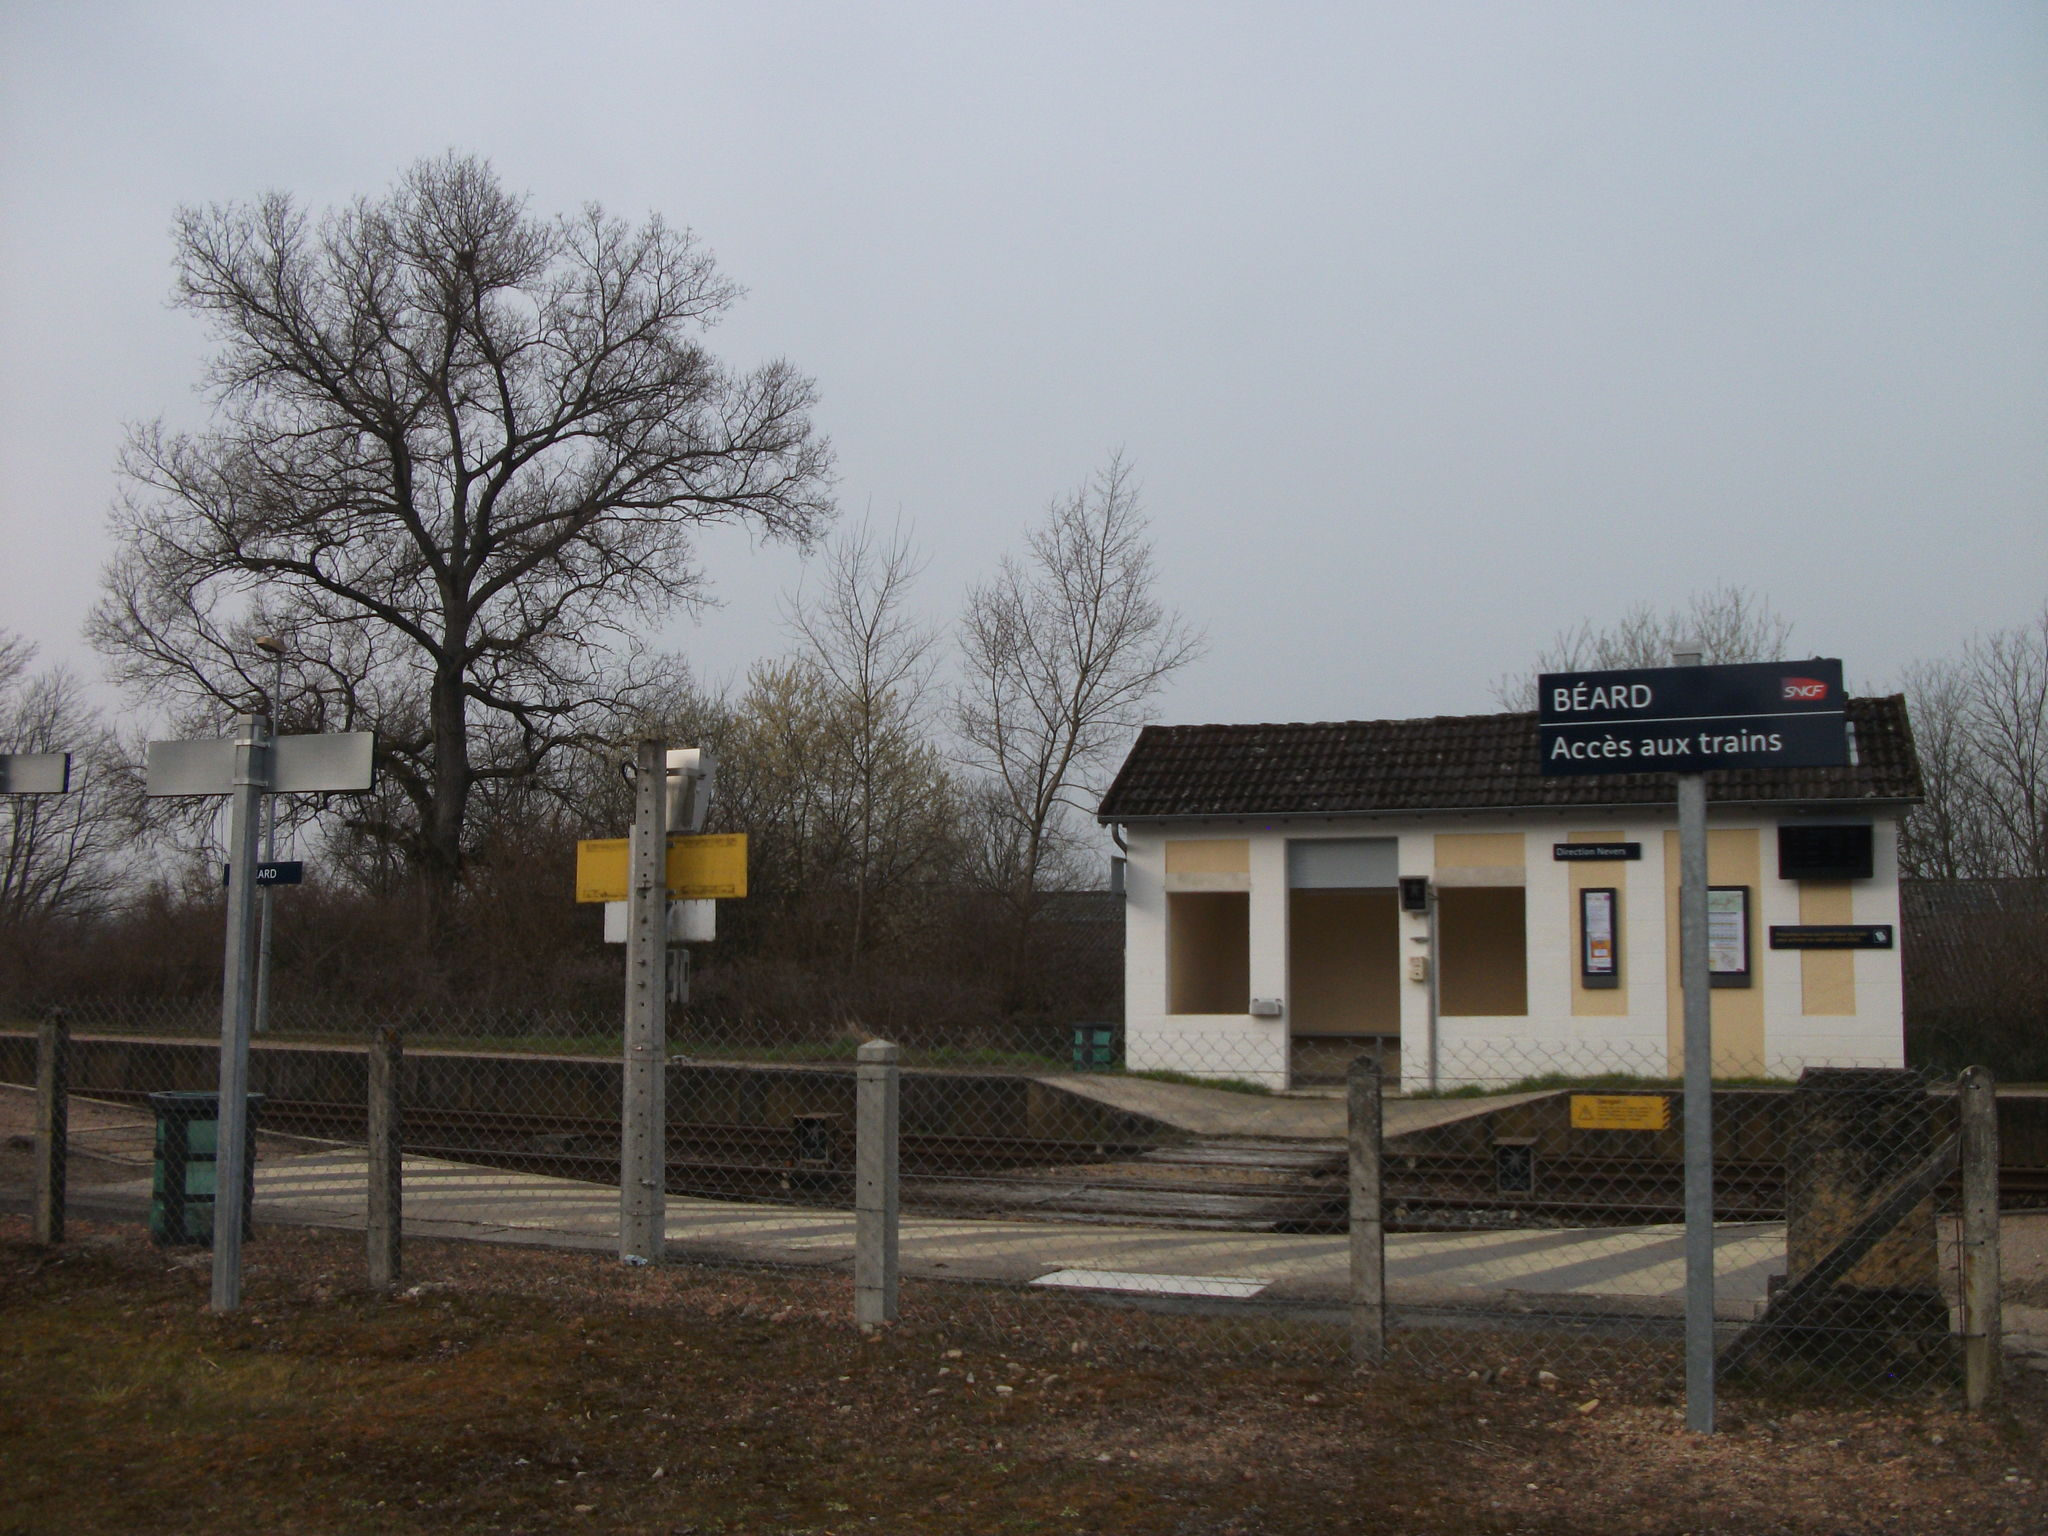 Béard (Nièvre)